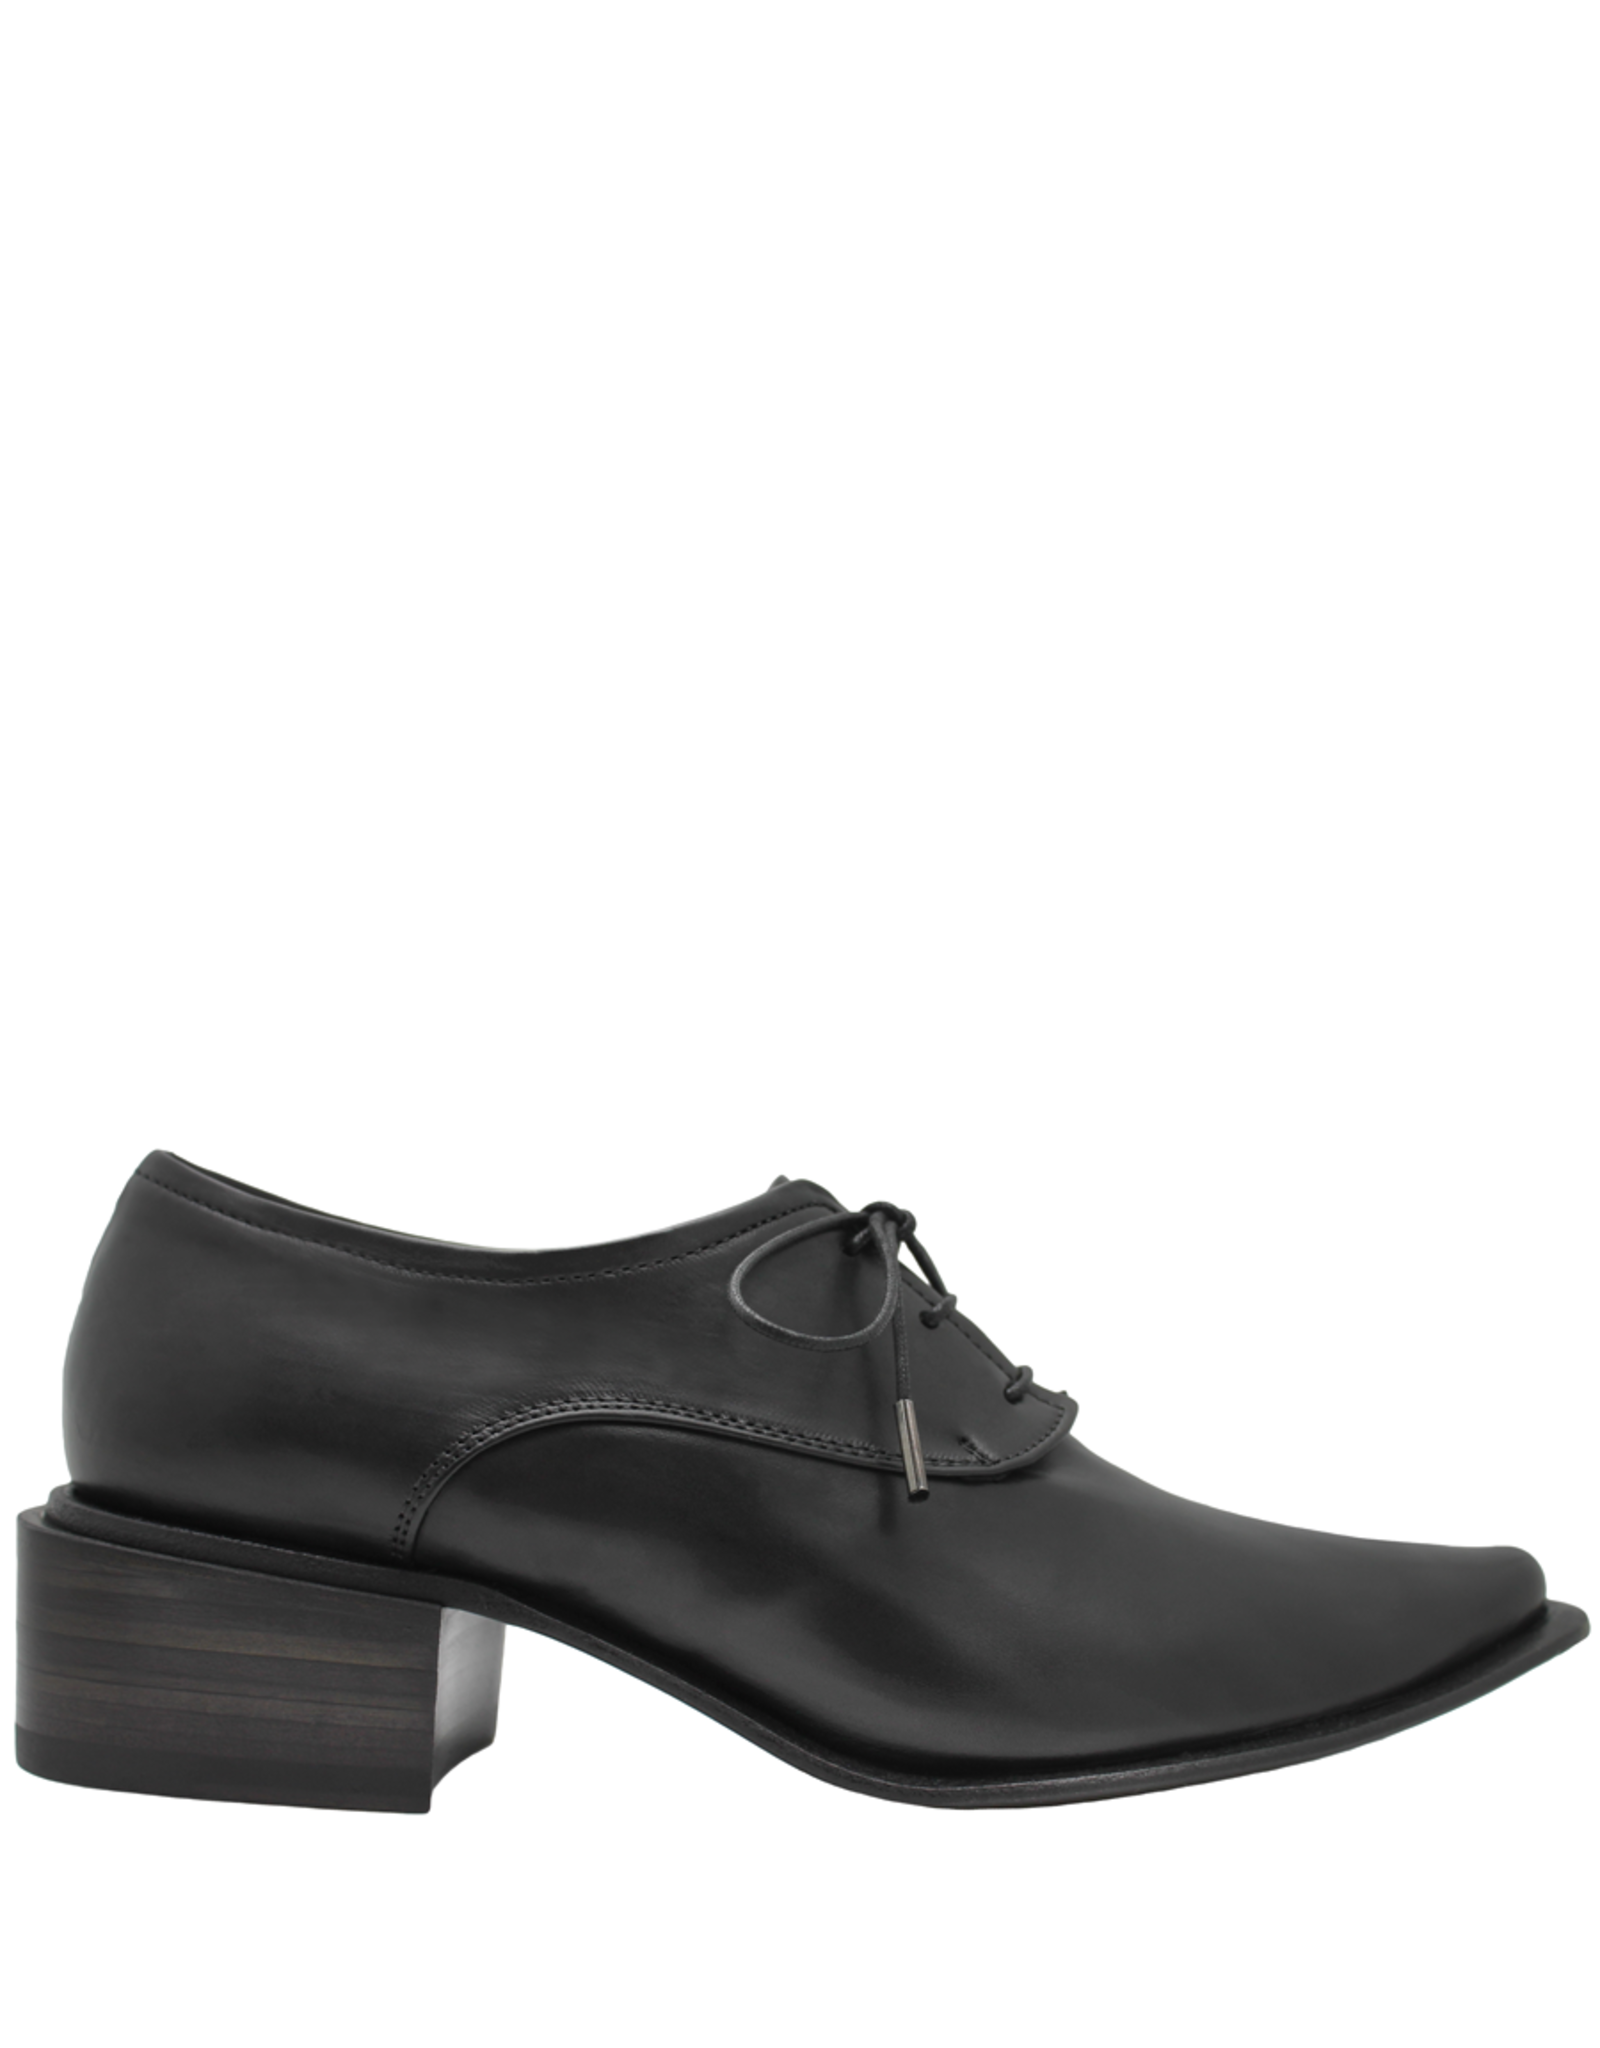 Ink Black Soft Nappa Lace-Up Point Toe Shoe 3330